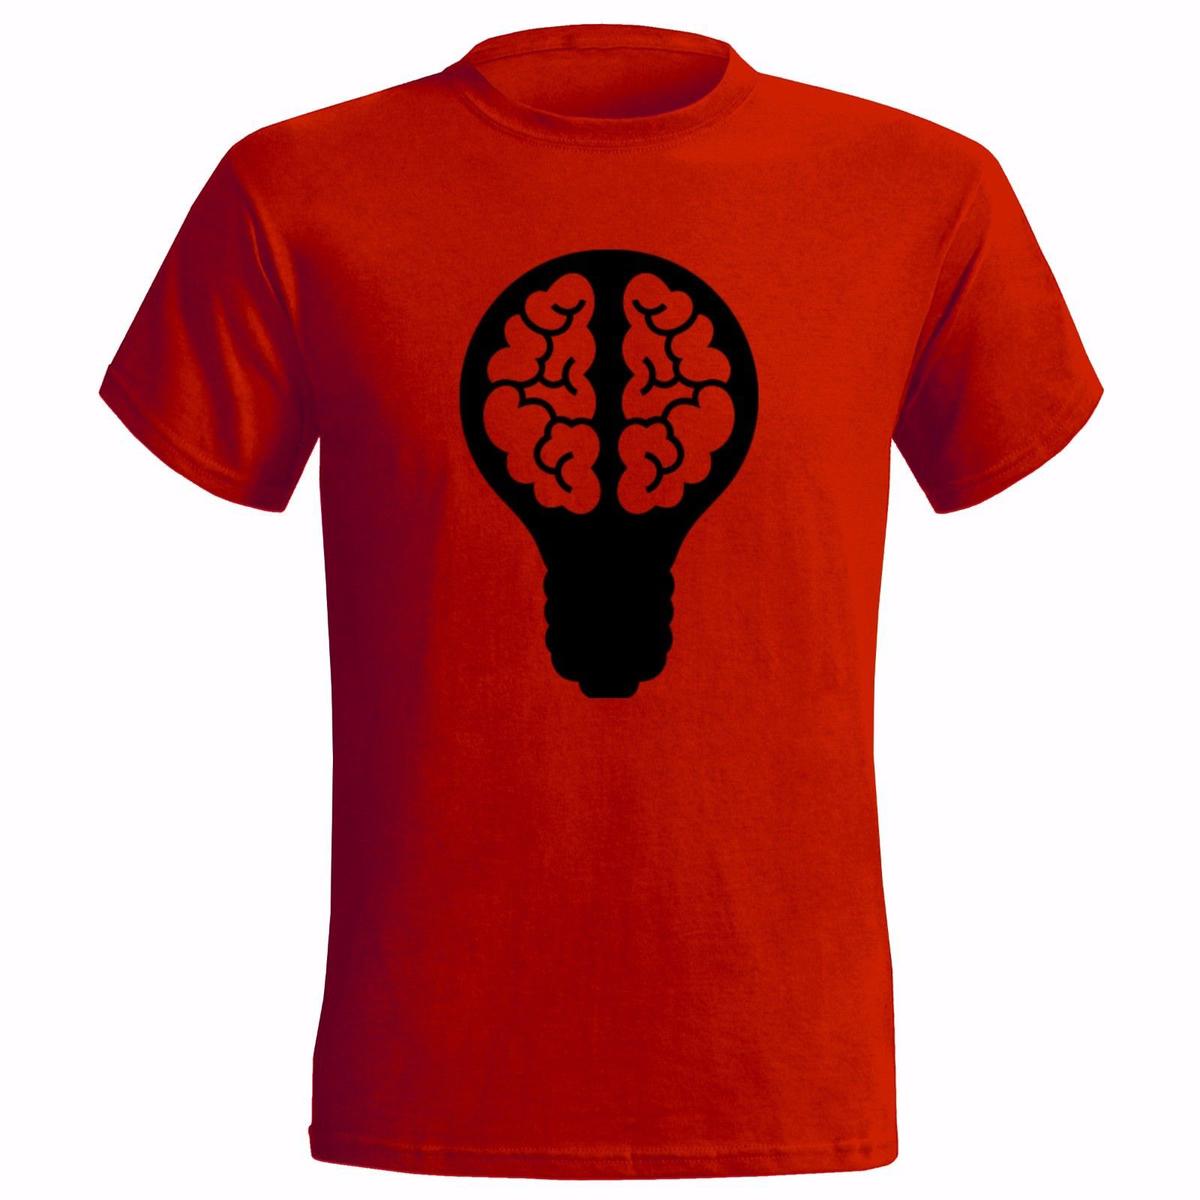 LIGHT BULB BRAIN DESIGN ART MENS T SHIRT IDEA THOUGHT THINKING FREEDOM IDEOLOGY tshirt hot new fashion top shirts